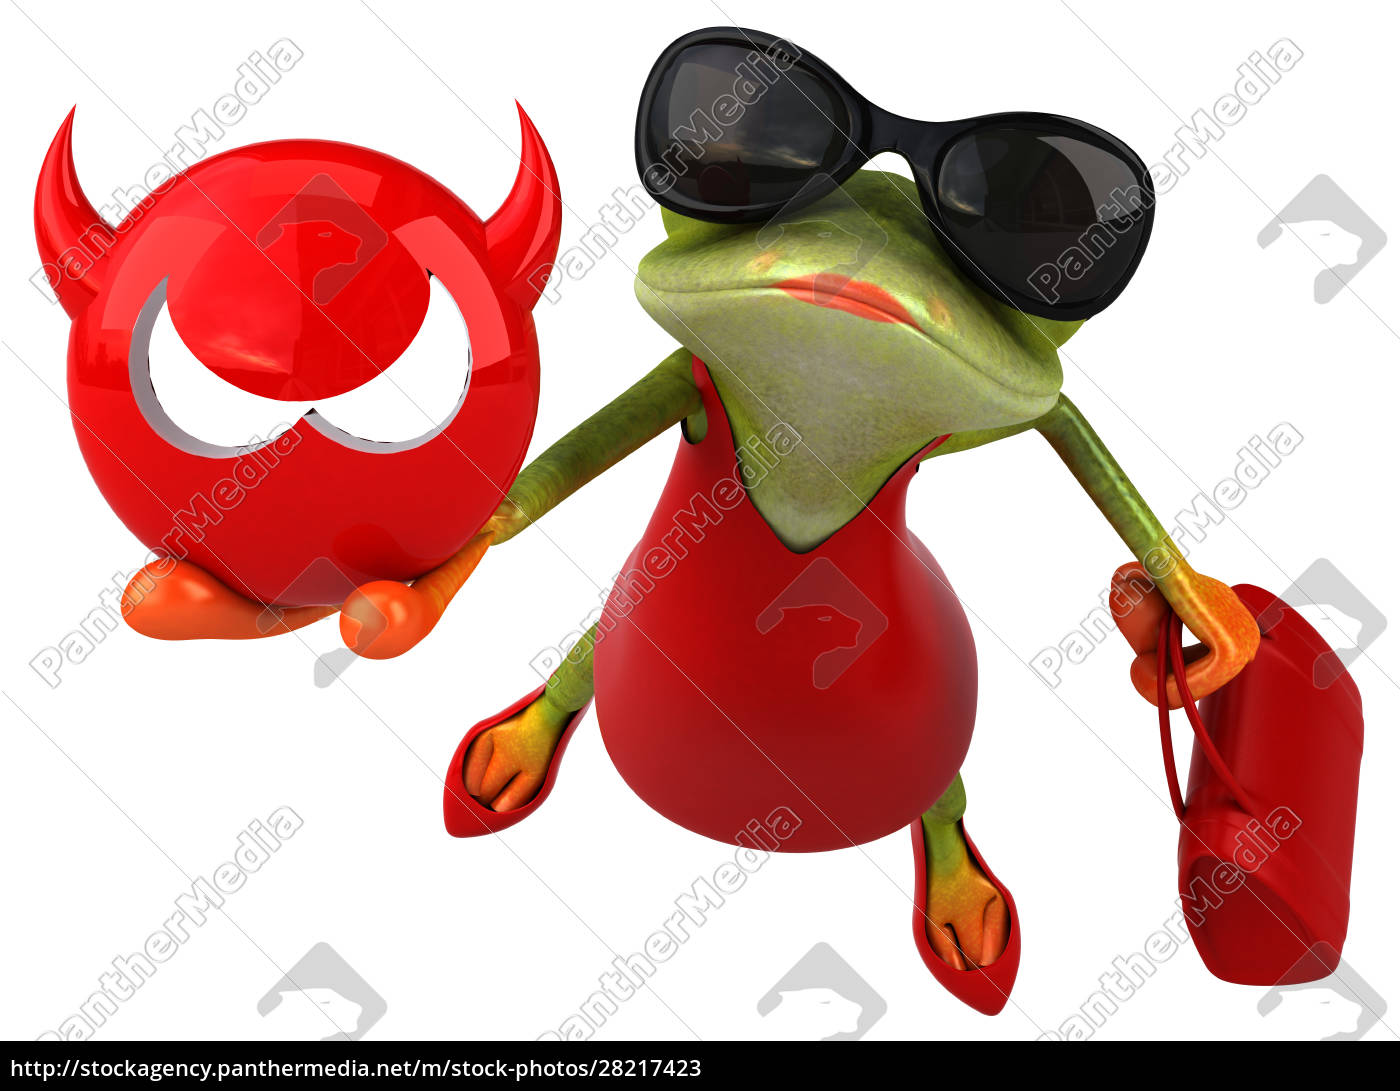 fun, frog, -, 3d, illustration - 28217423